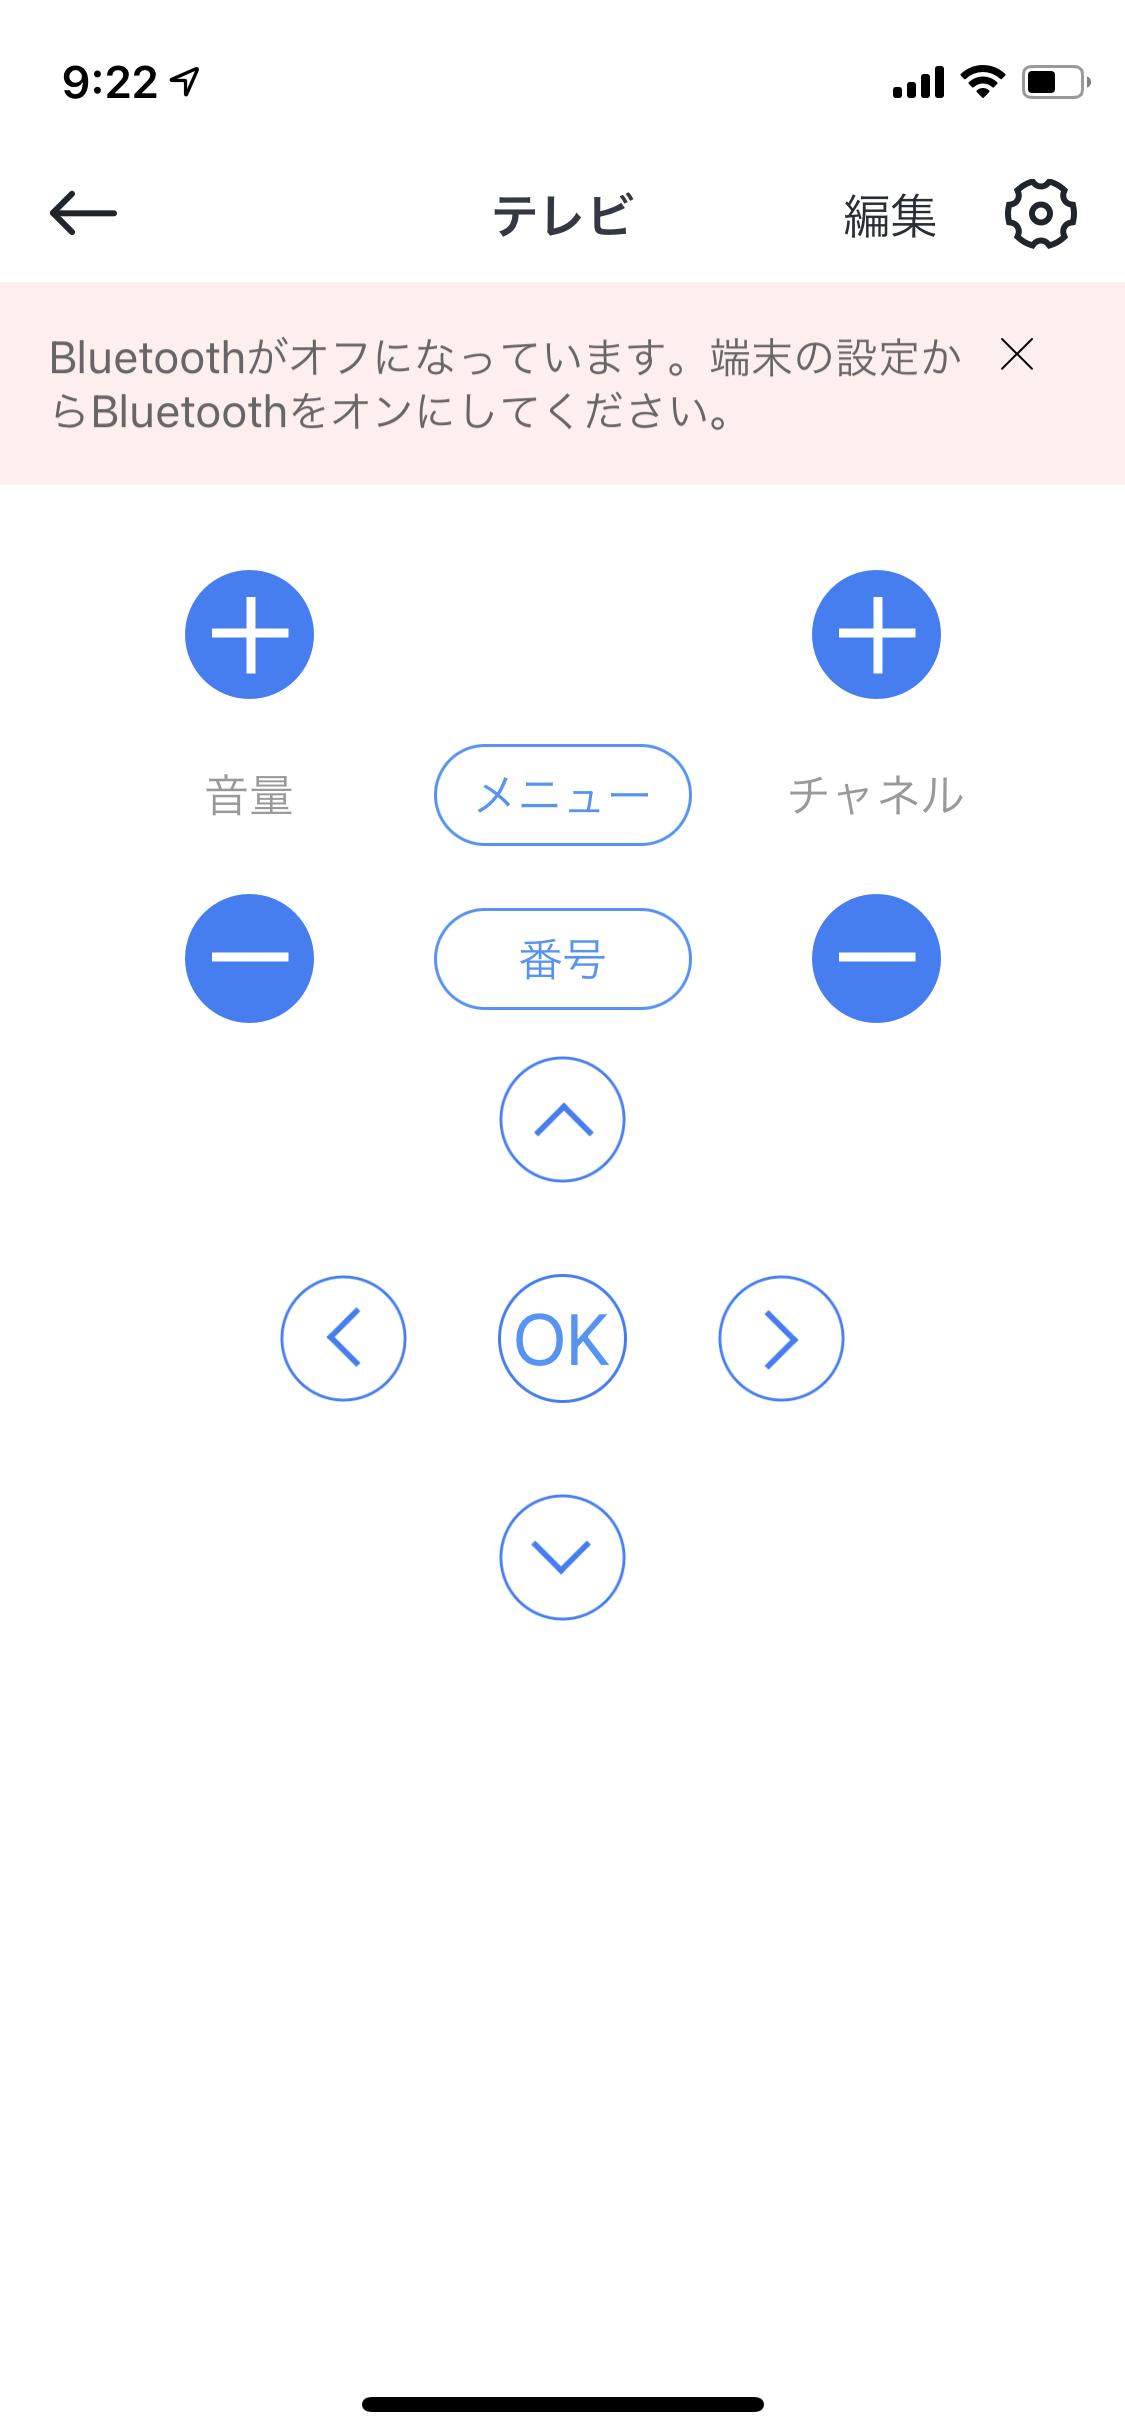 SwitchBot専用アプリの操作画面